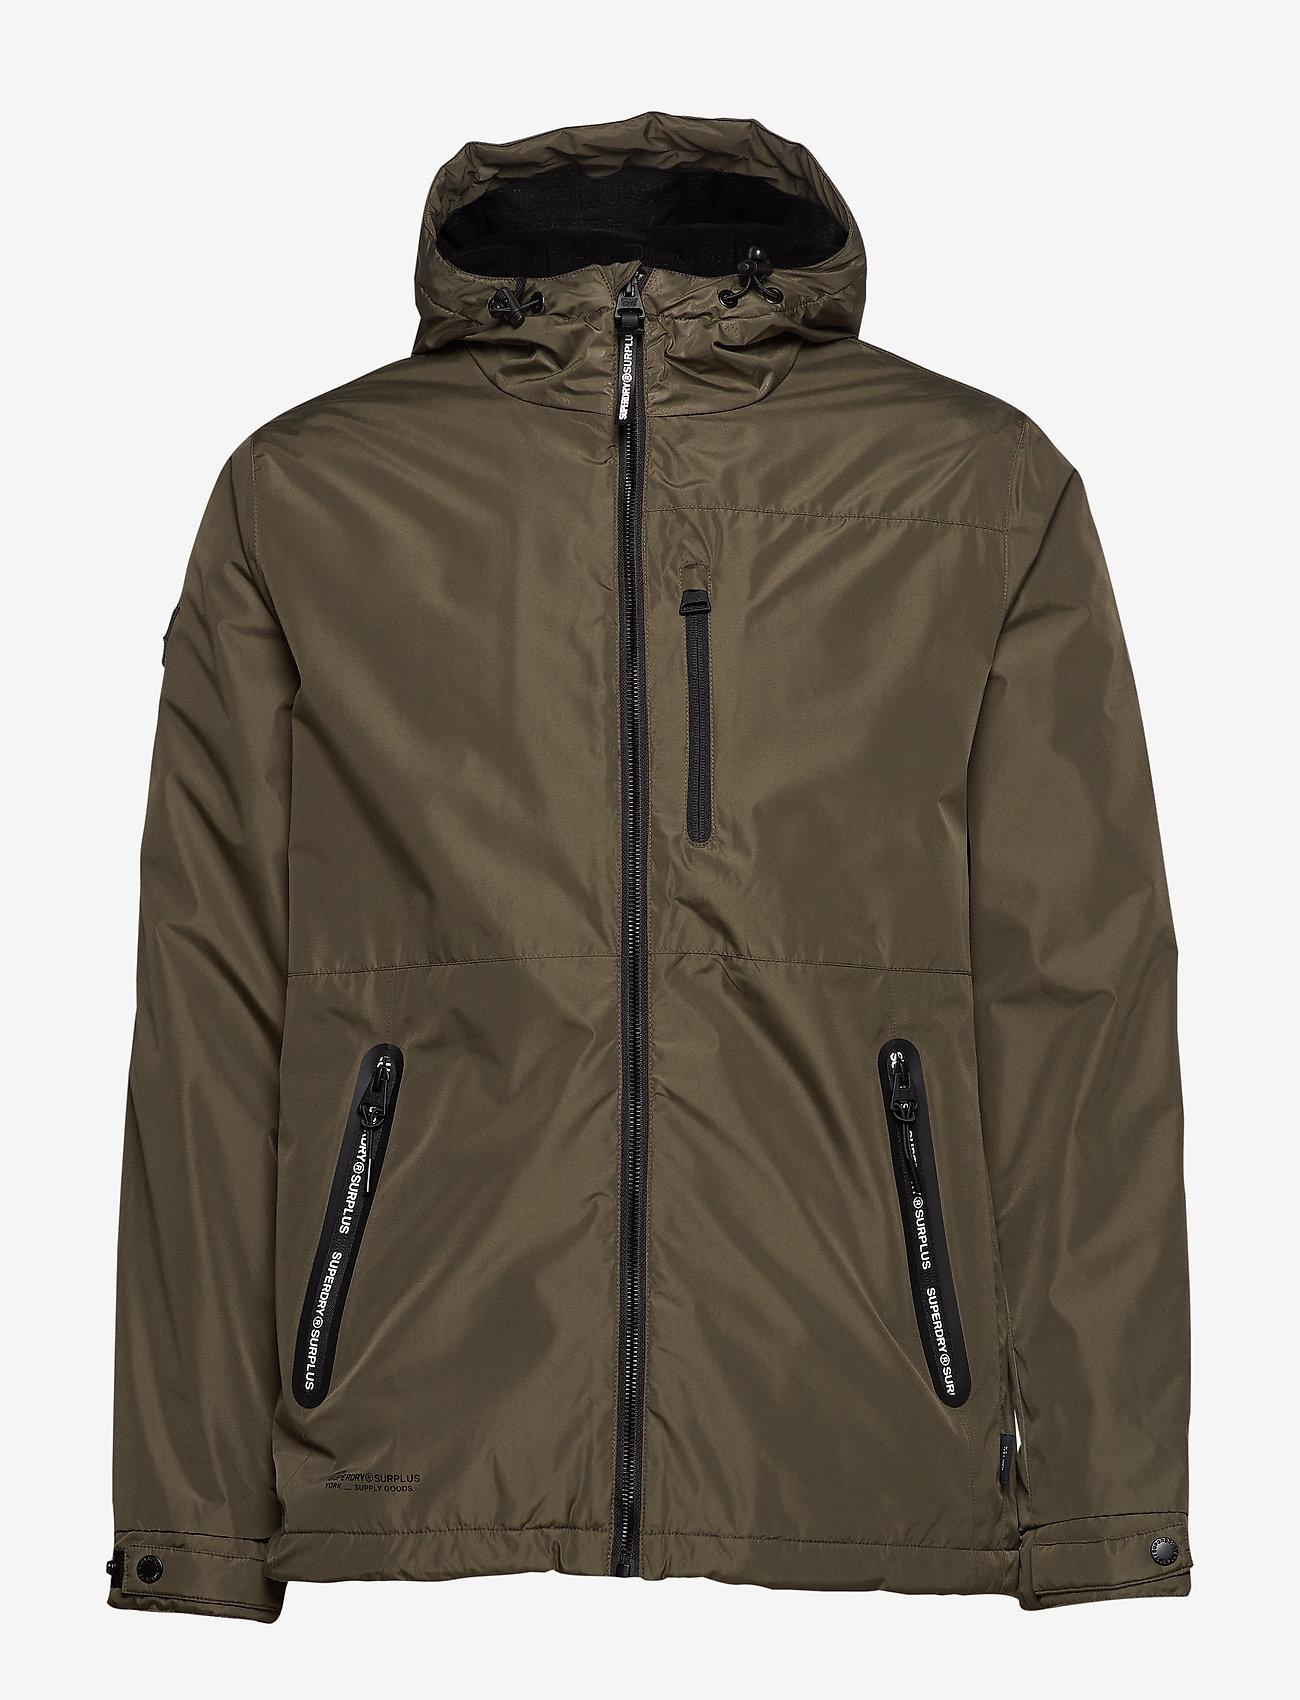 Superdry - SURPLUS GOODS HIKER JACKET - light jackets - surplus goods army kho - 1